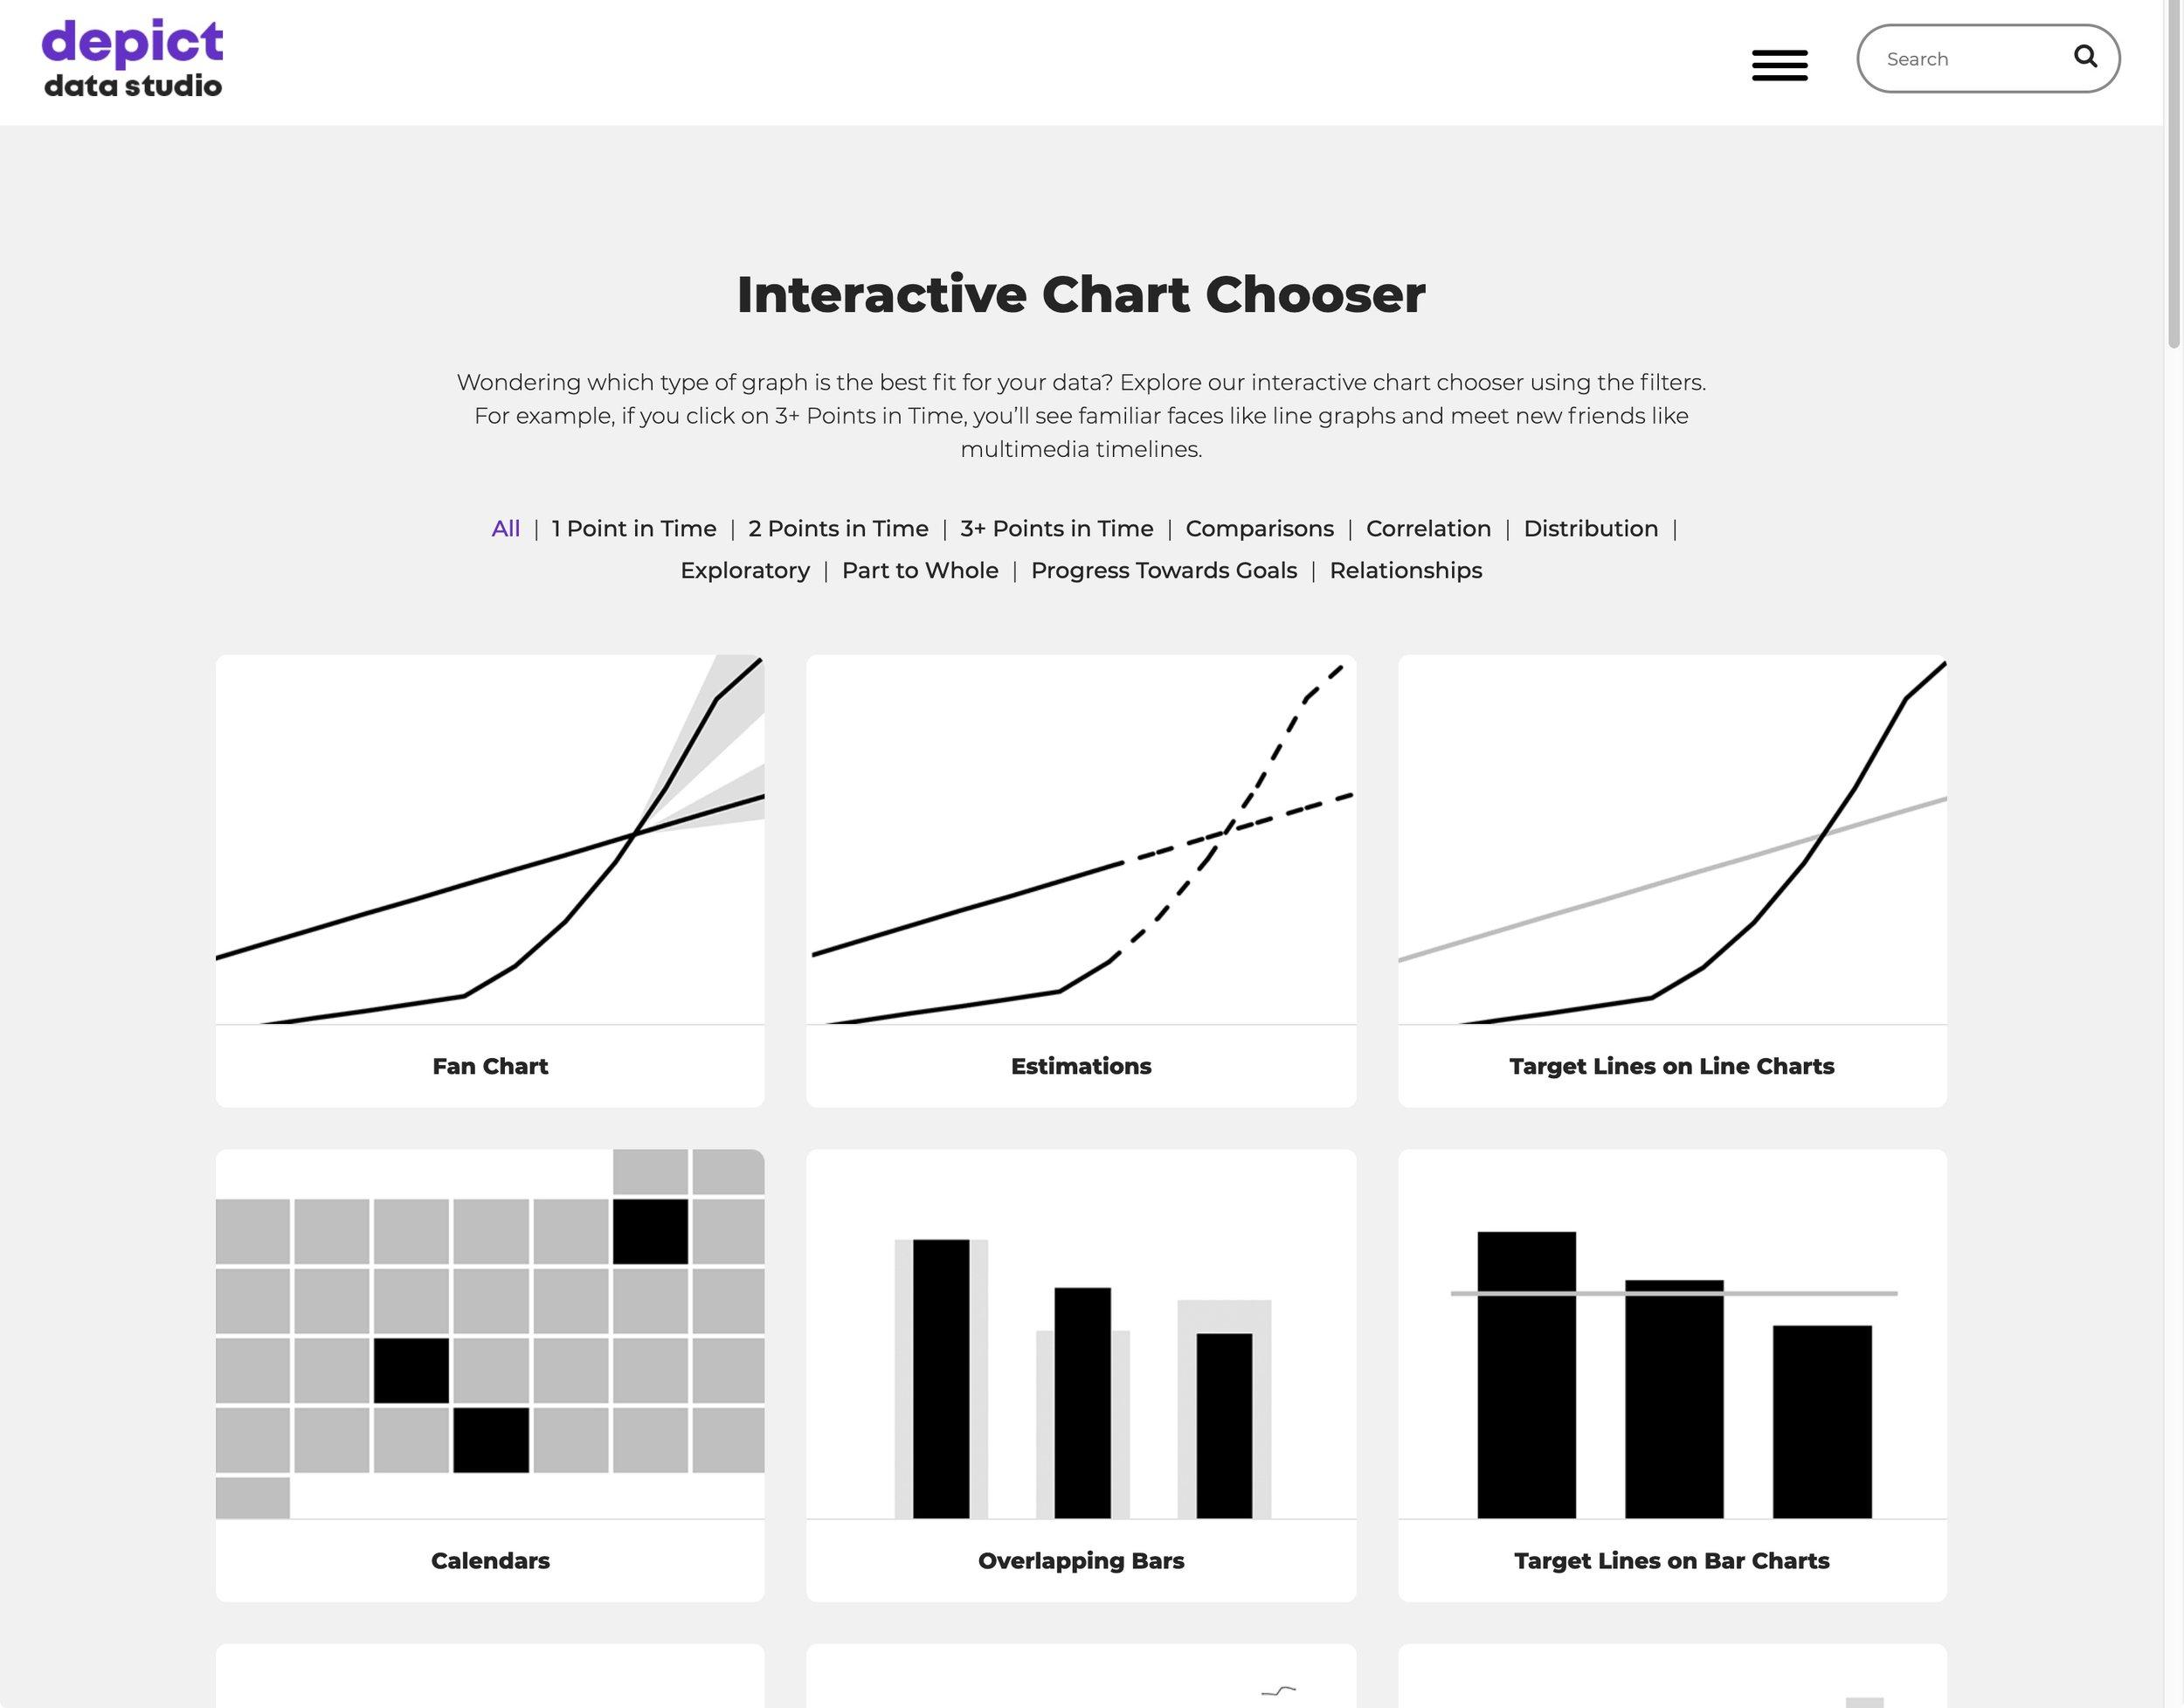 Interactive Chart Chooser from Depict Data Studio